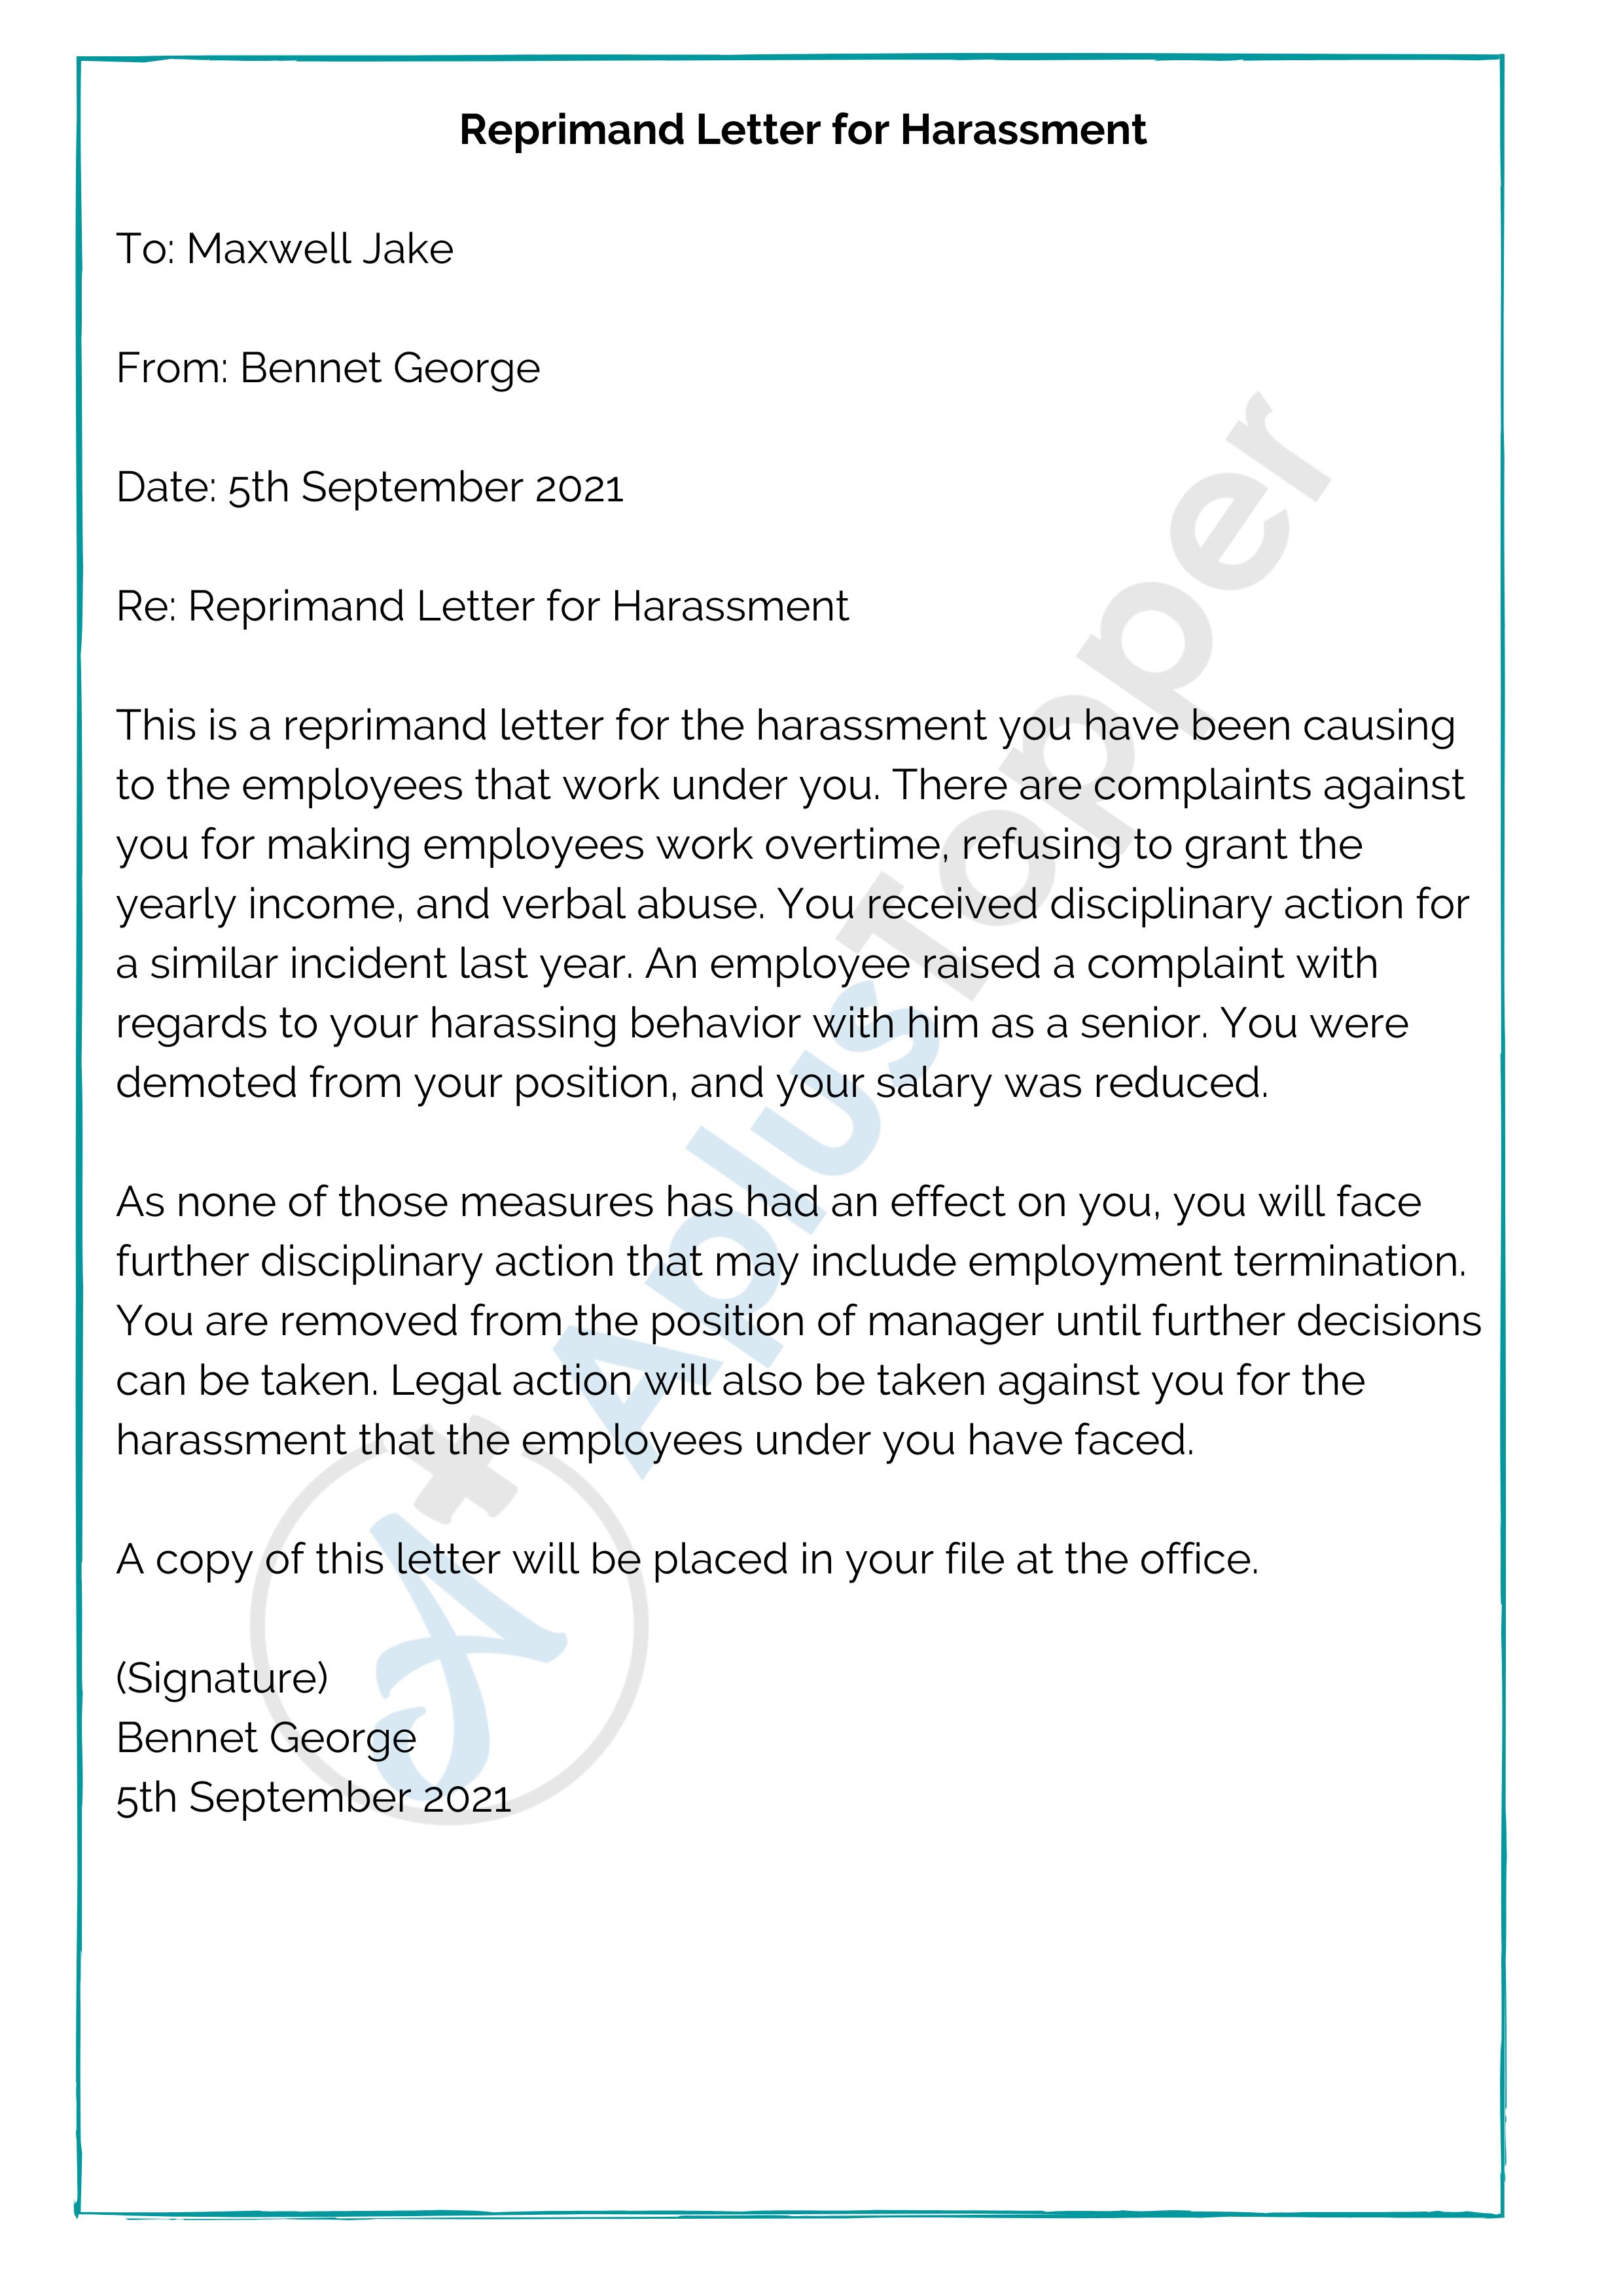 Reprimand Letter for Harassment